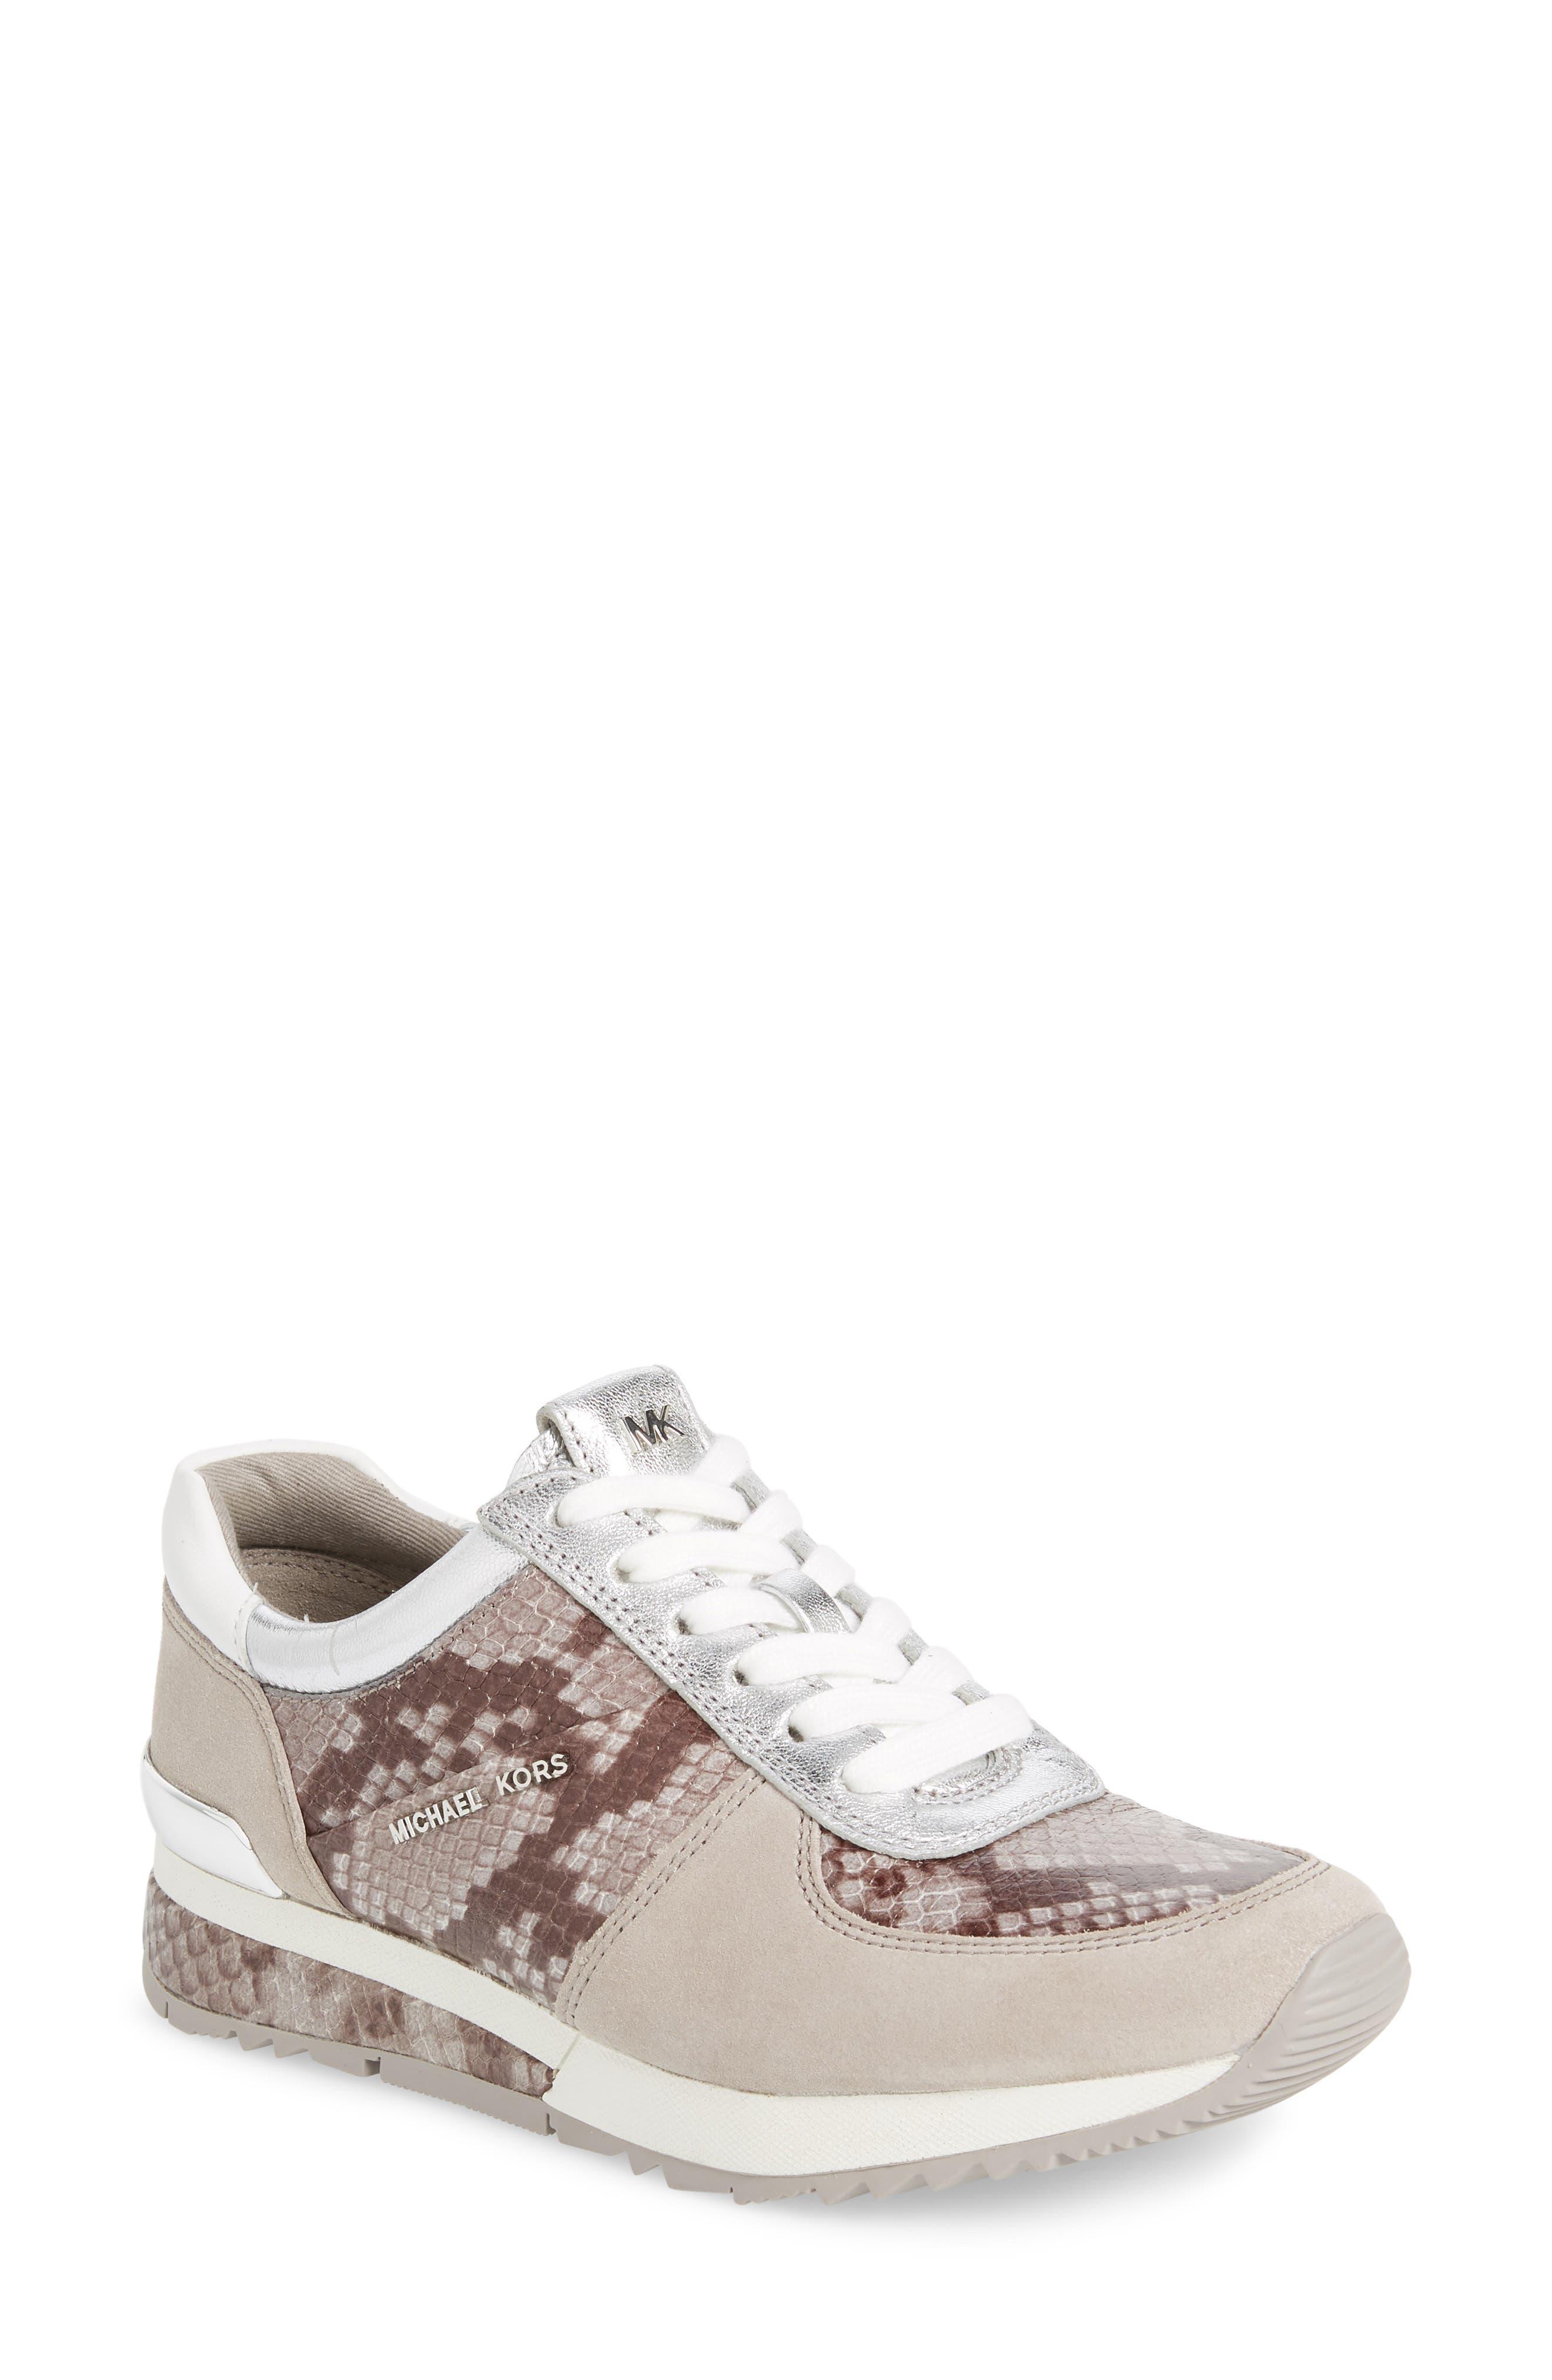 Michael Michael Kors Allie Wrap Trainer Sneakers- Grey